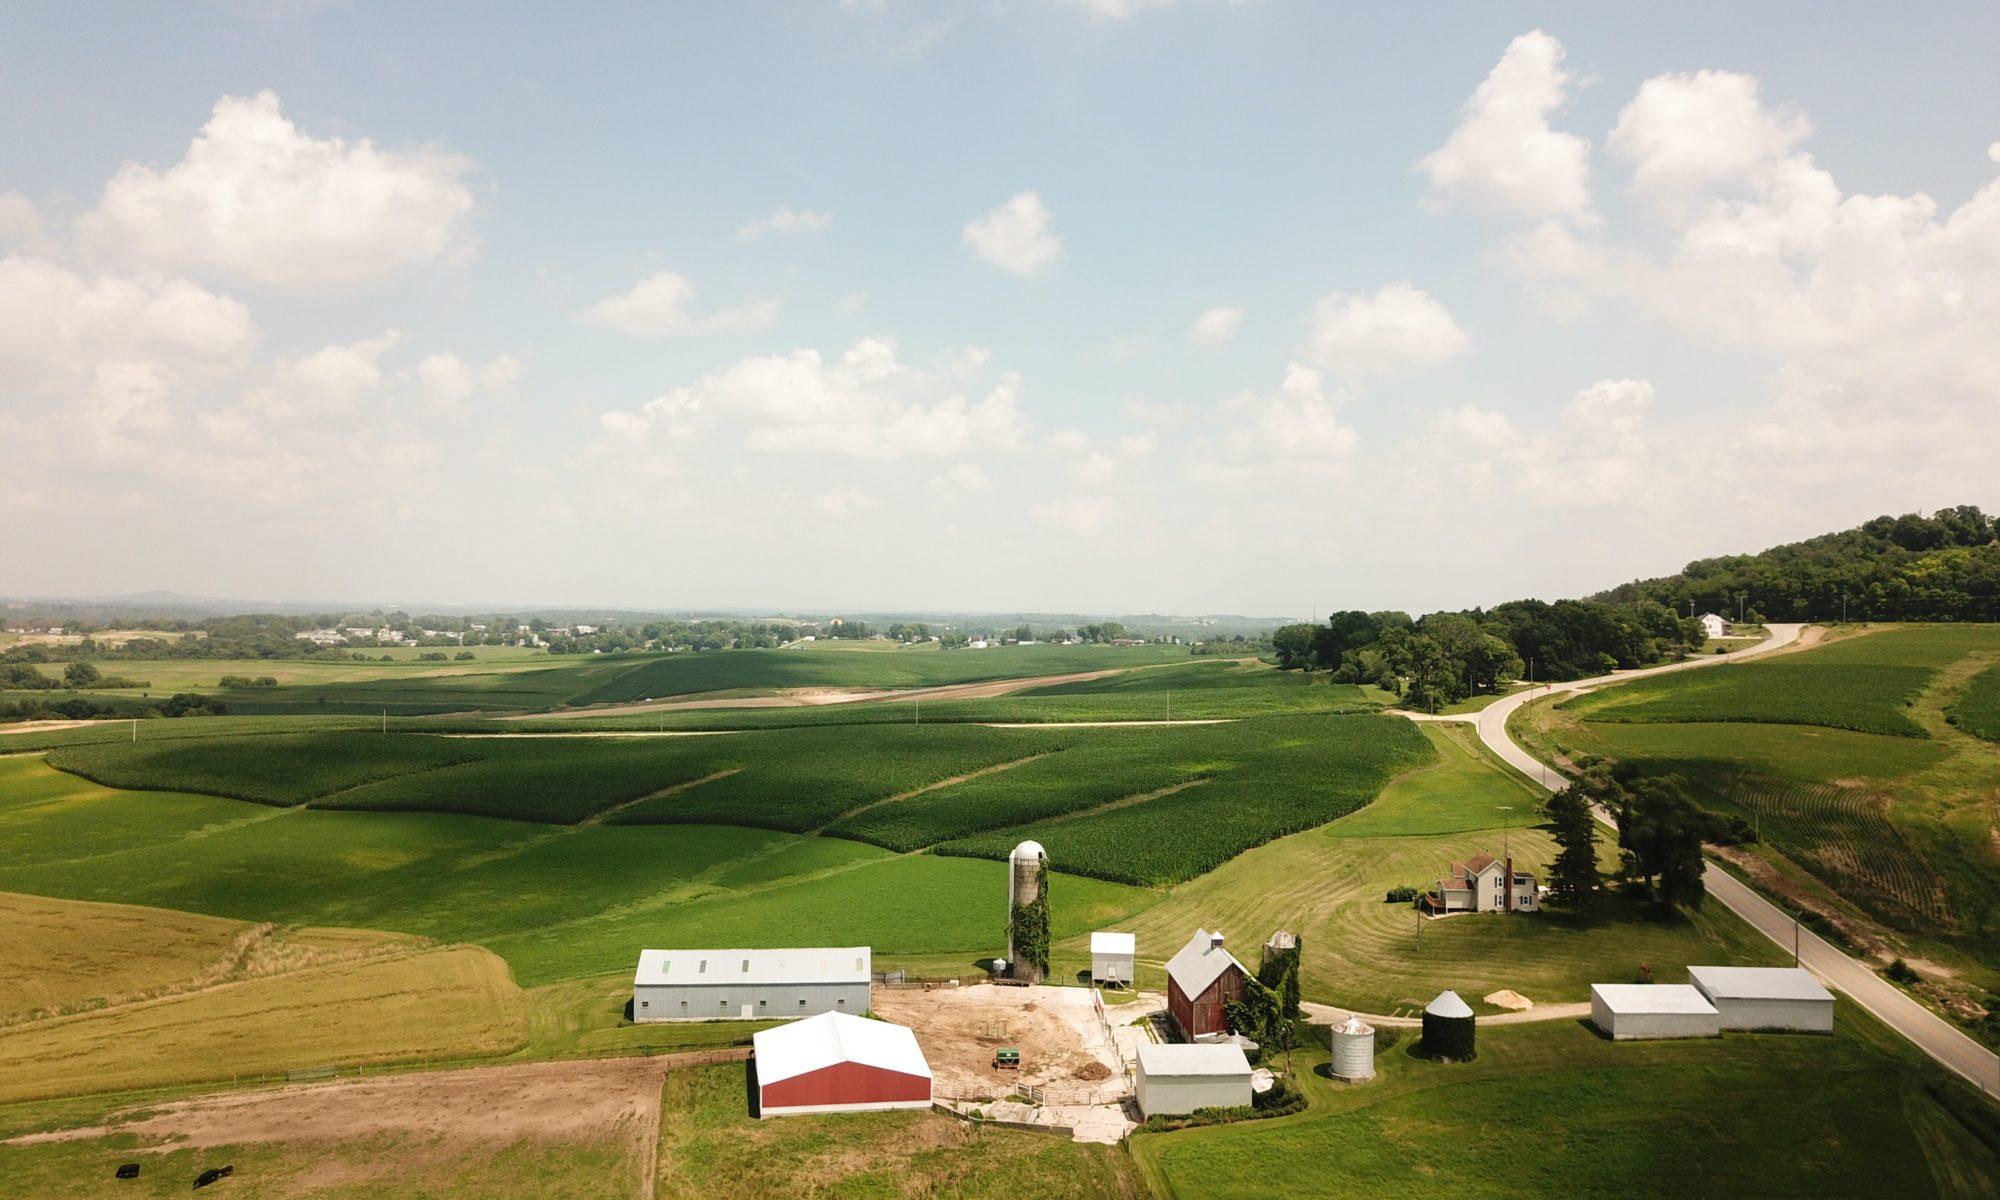 Aerial photo of farming operation